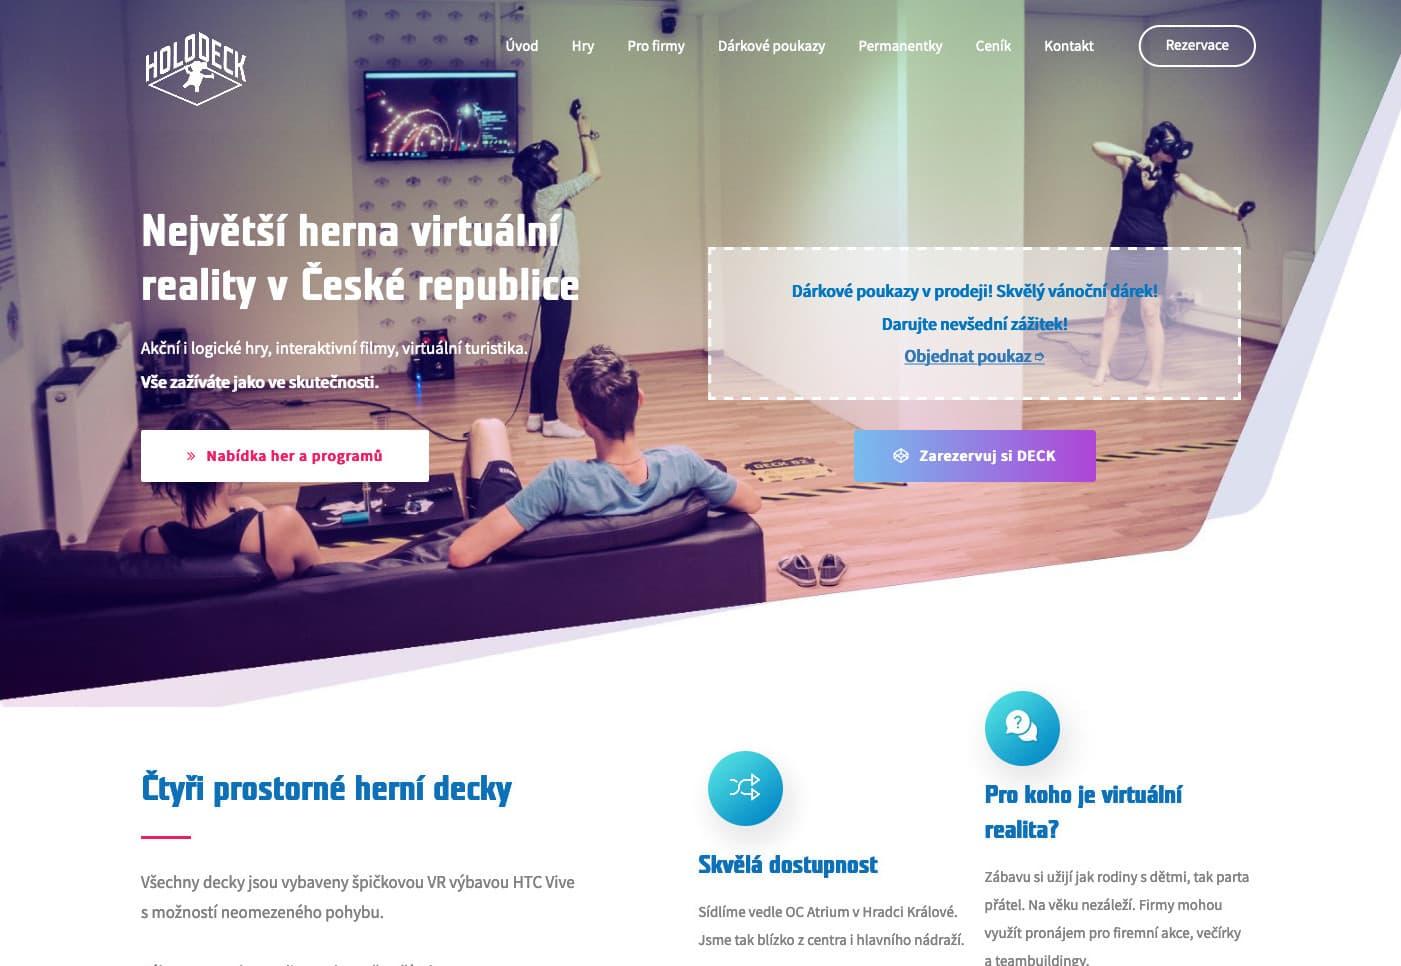 Holodeck – Virtuální realita